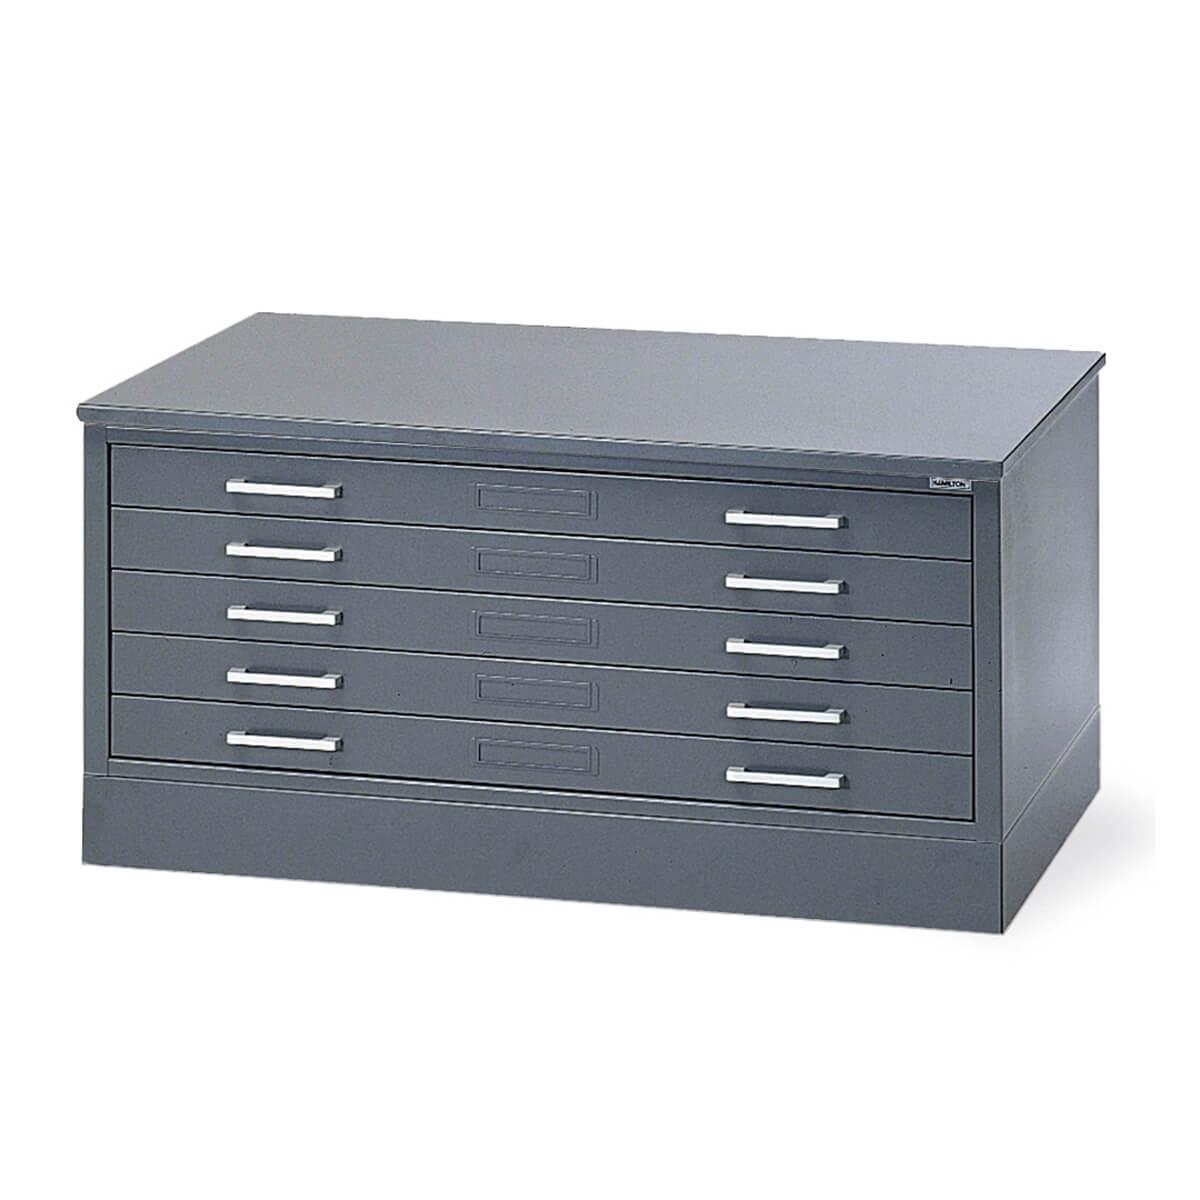 Hamilton Flat File Cabinets by Mayline | TALAS